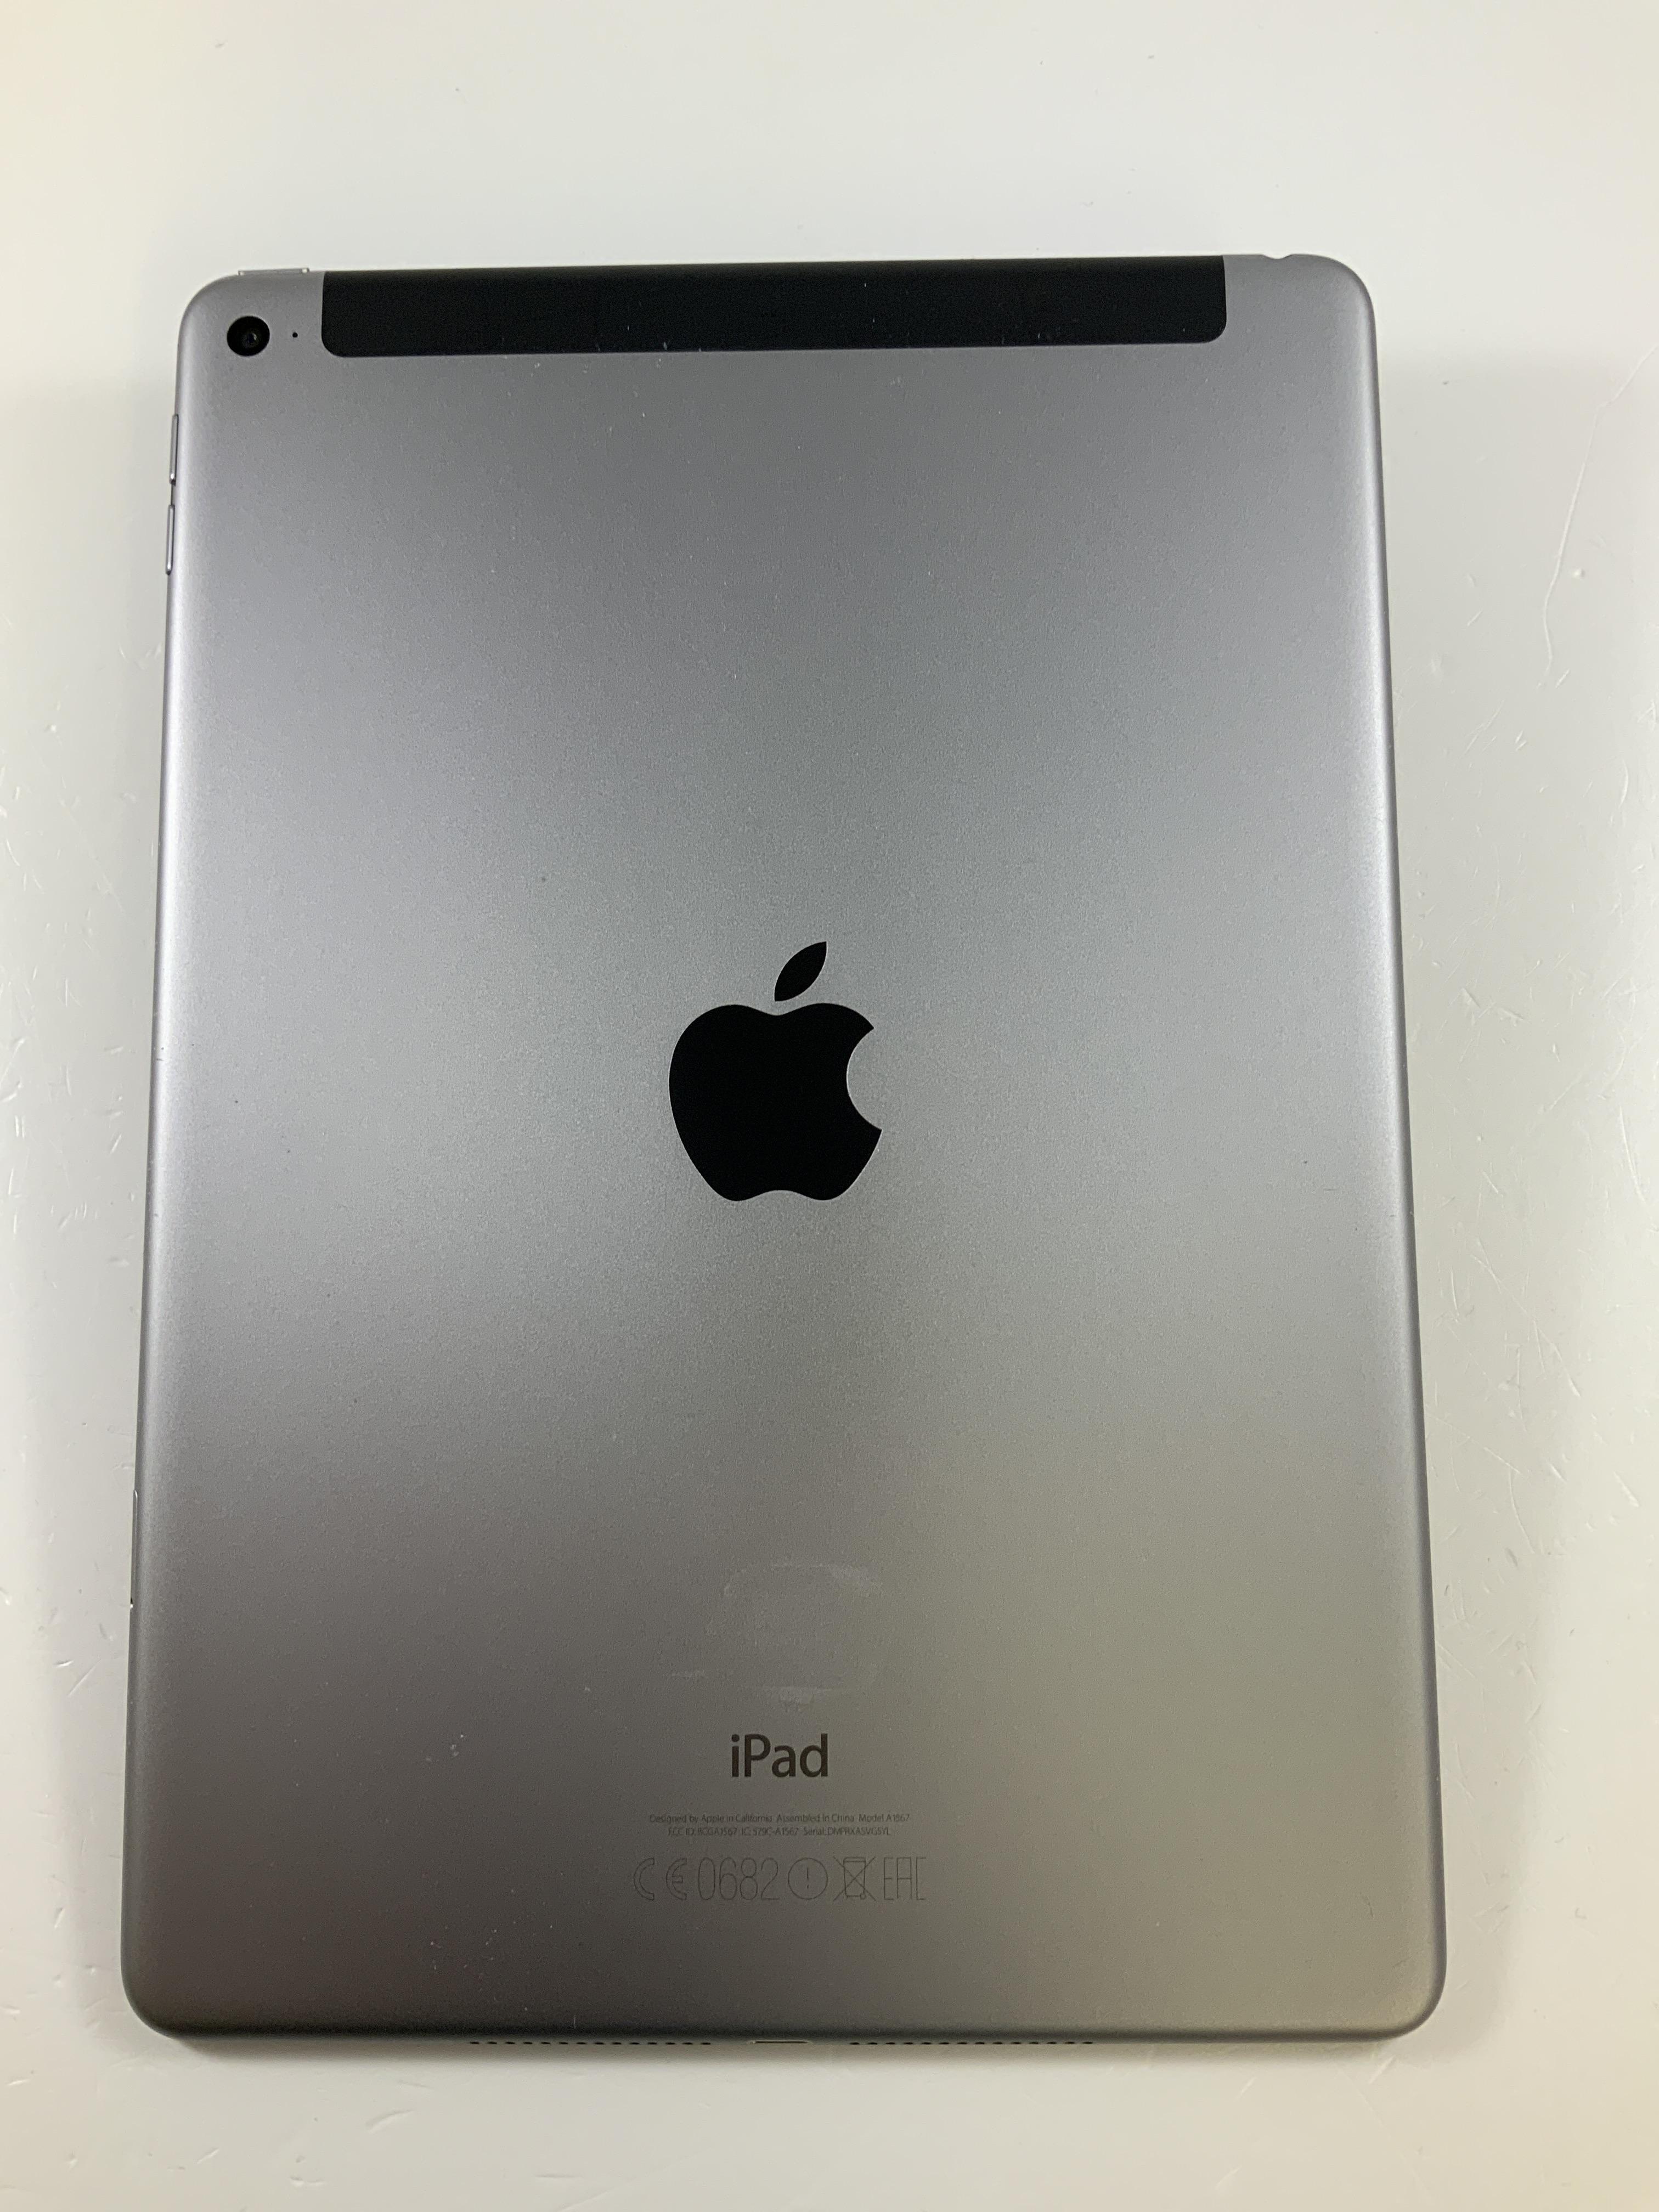 iPad Air 2 Wi-Fi + Cellular 64GB, 64GB, Space Gray, bild 2